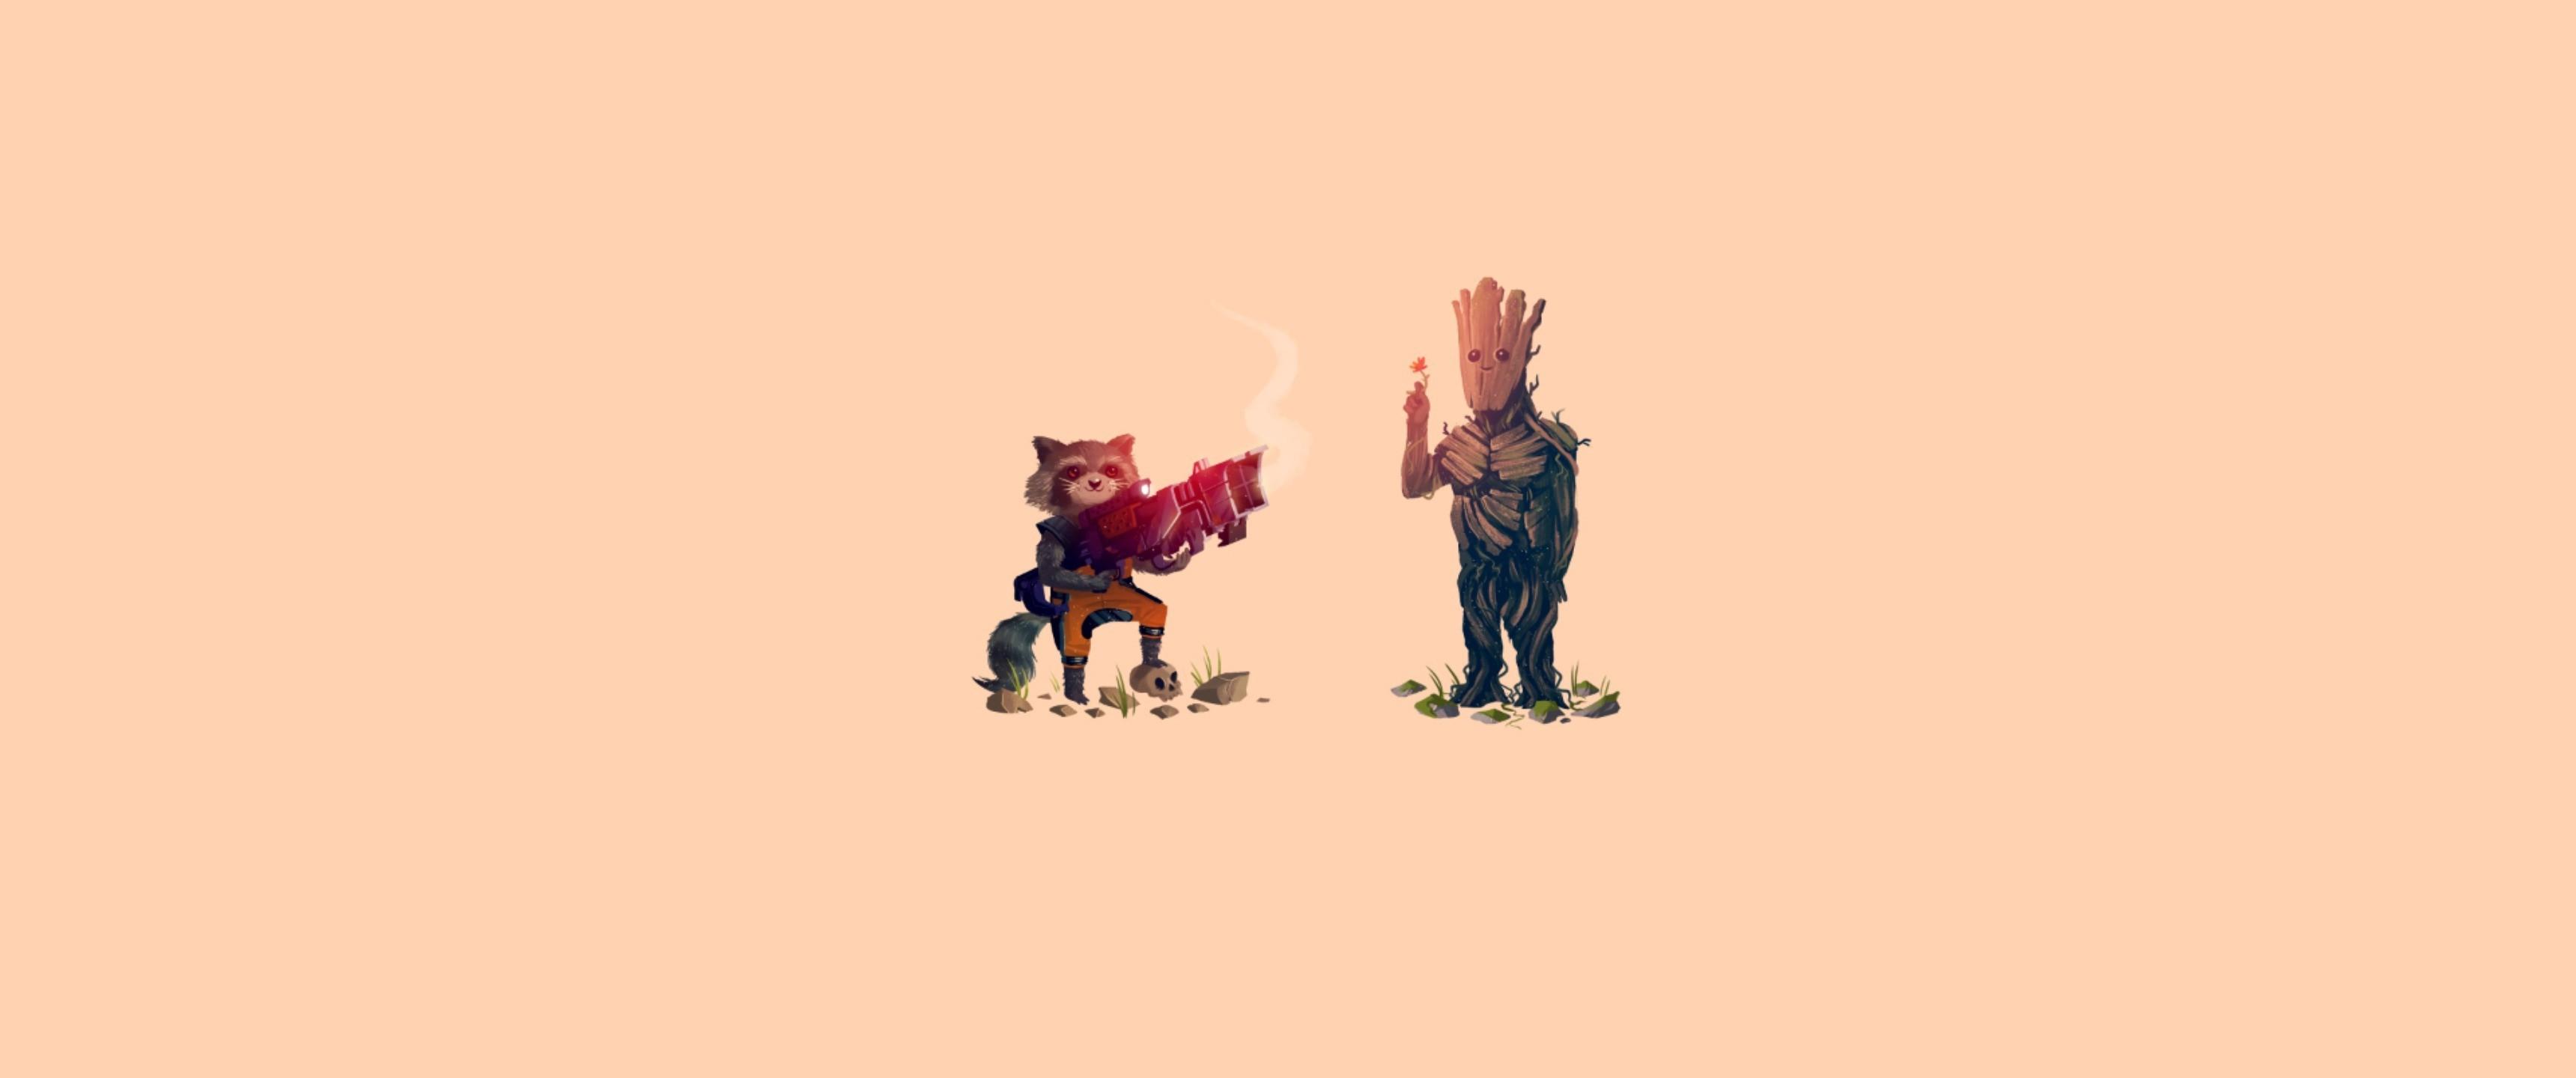 3440x1440 Px Groot Guardians Of The Galaxy Rocket Raccoon